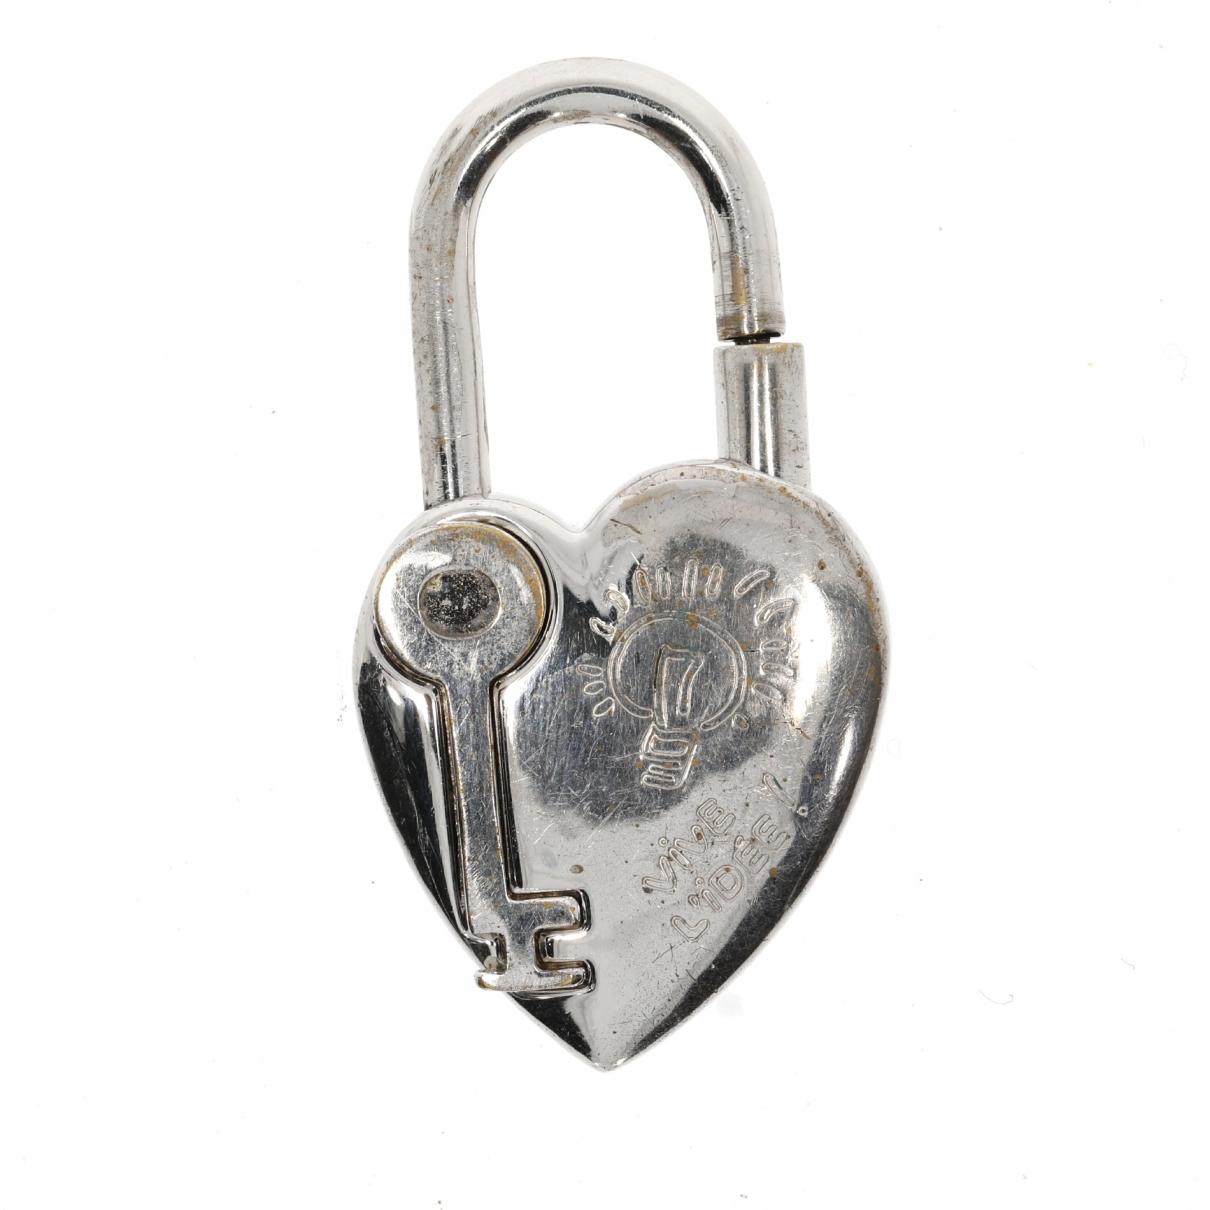 Hermes Cadenas Taschenschmuck in  Silber Metall